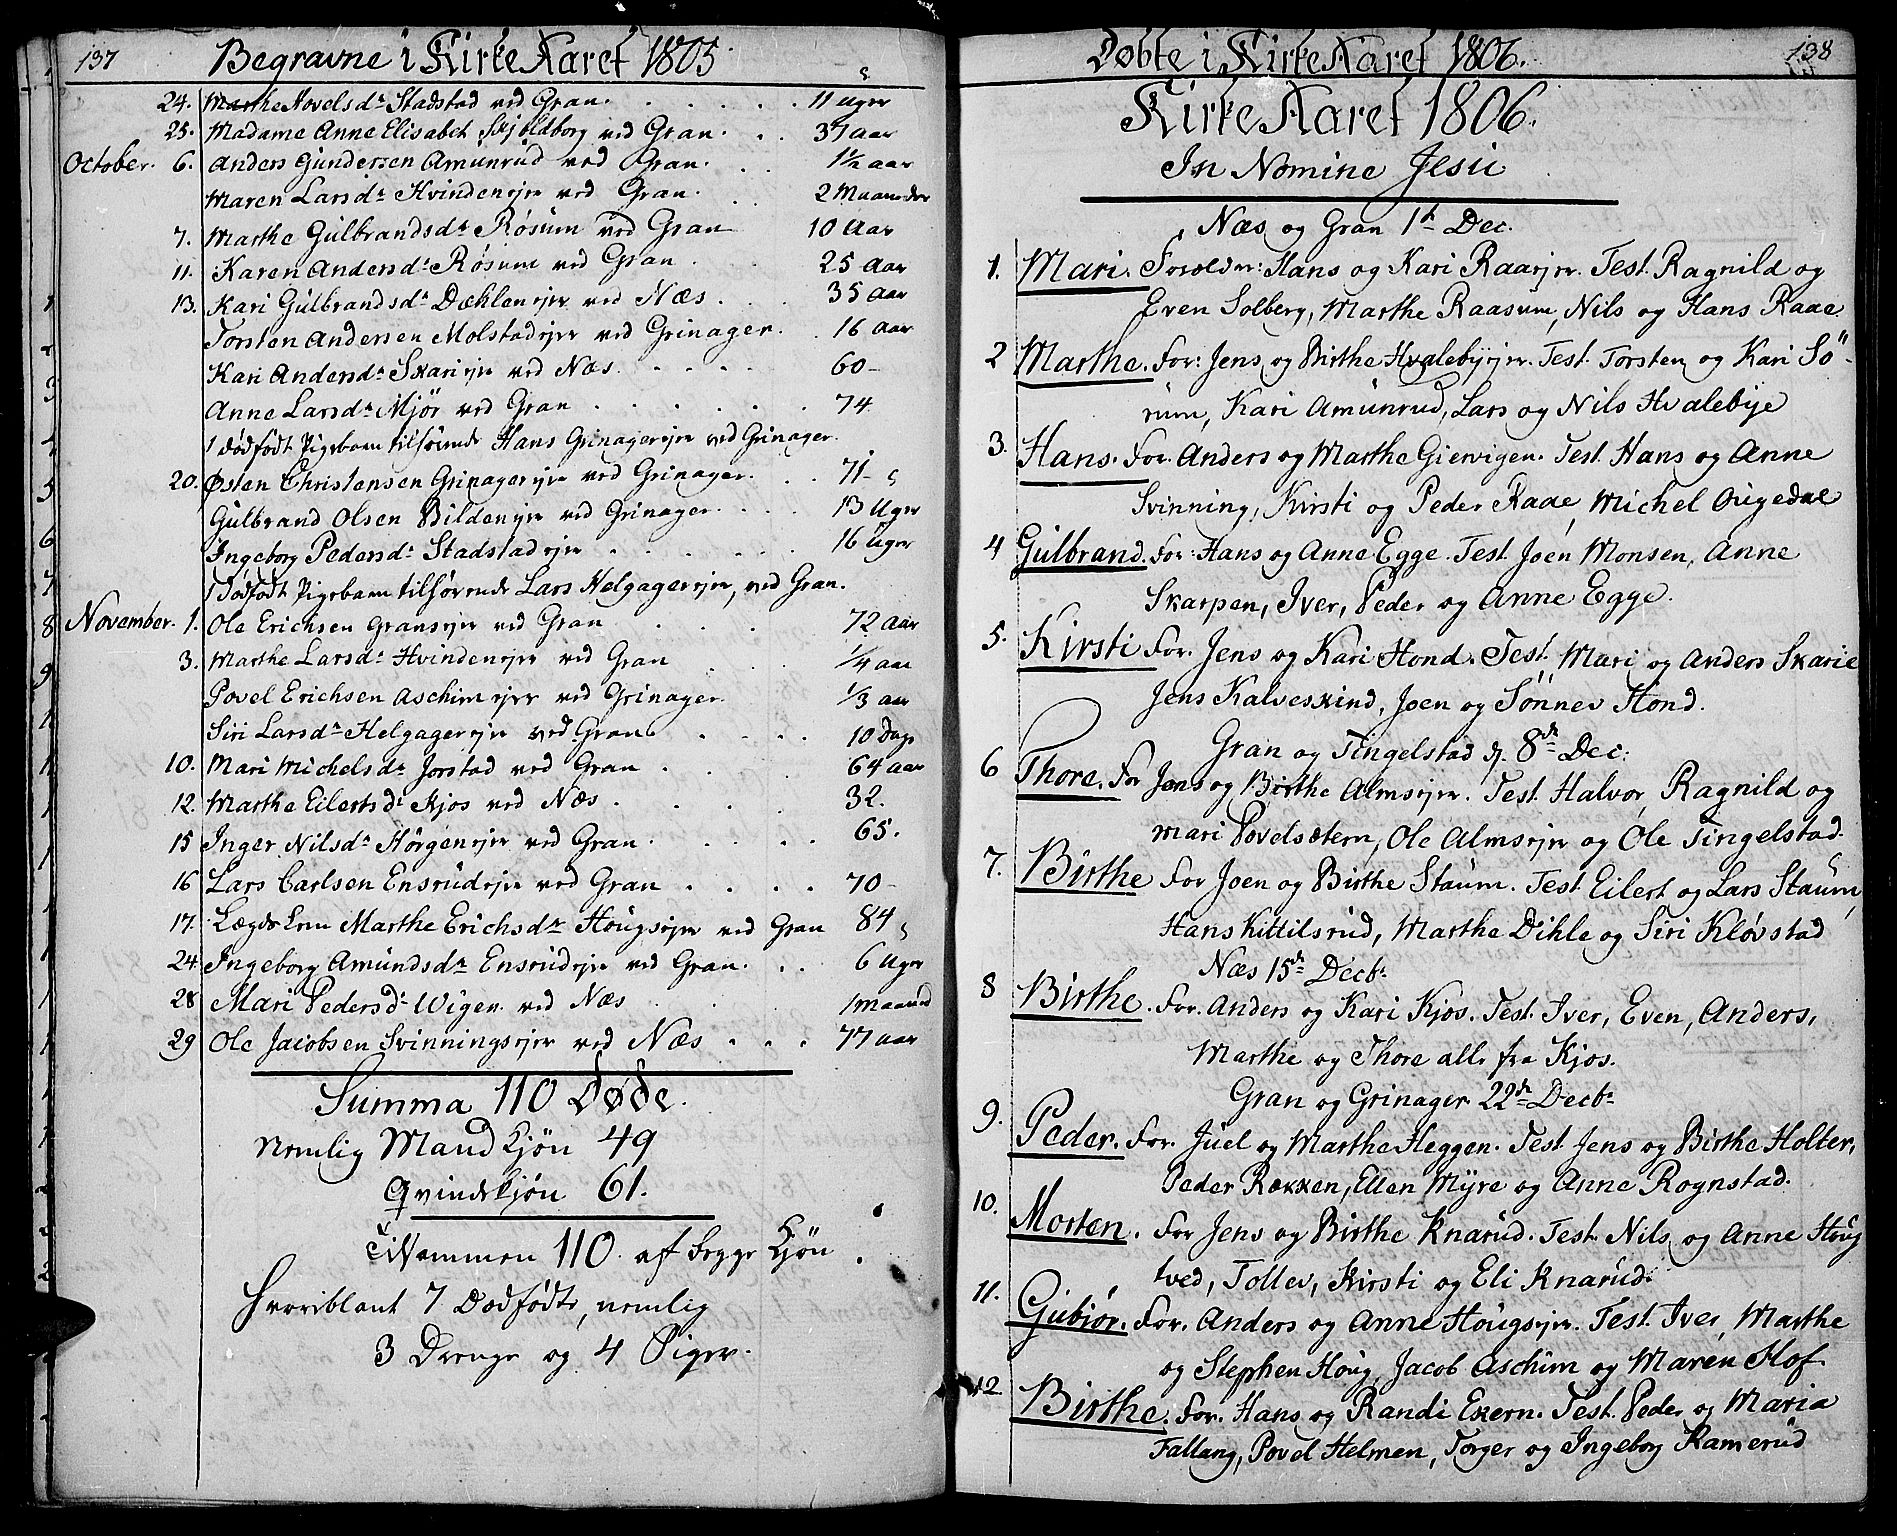 SAH, Gran prestekontor, Ministerialbok nr. 8, 1798-1811, s. 137-138